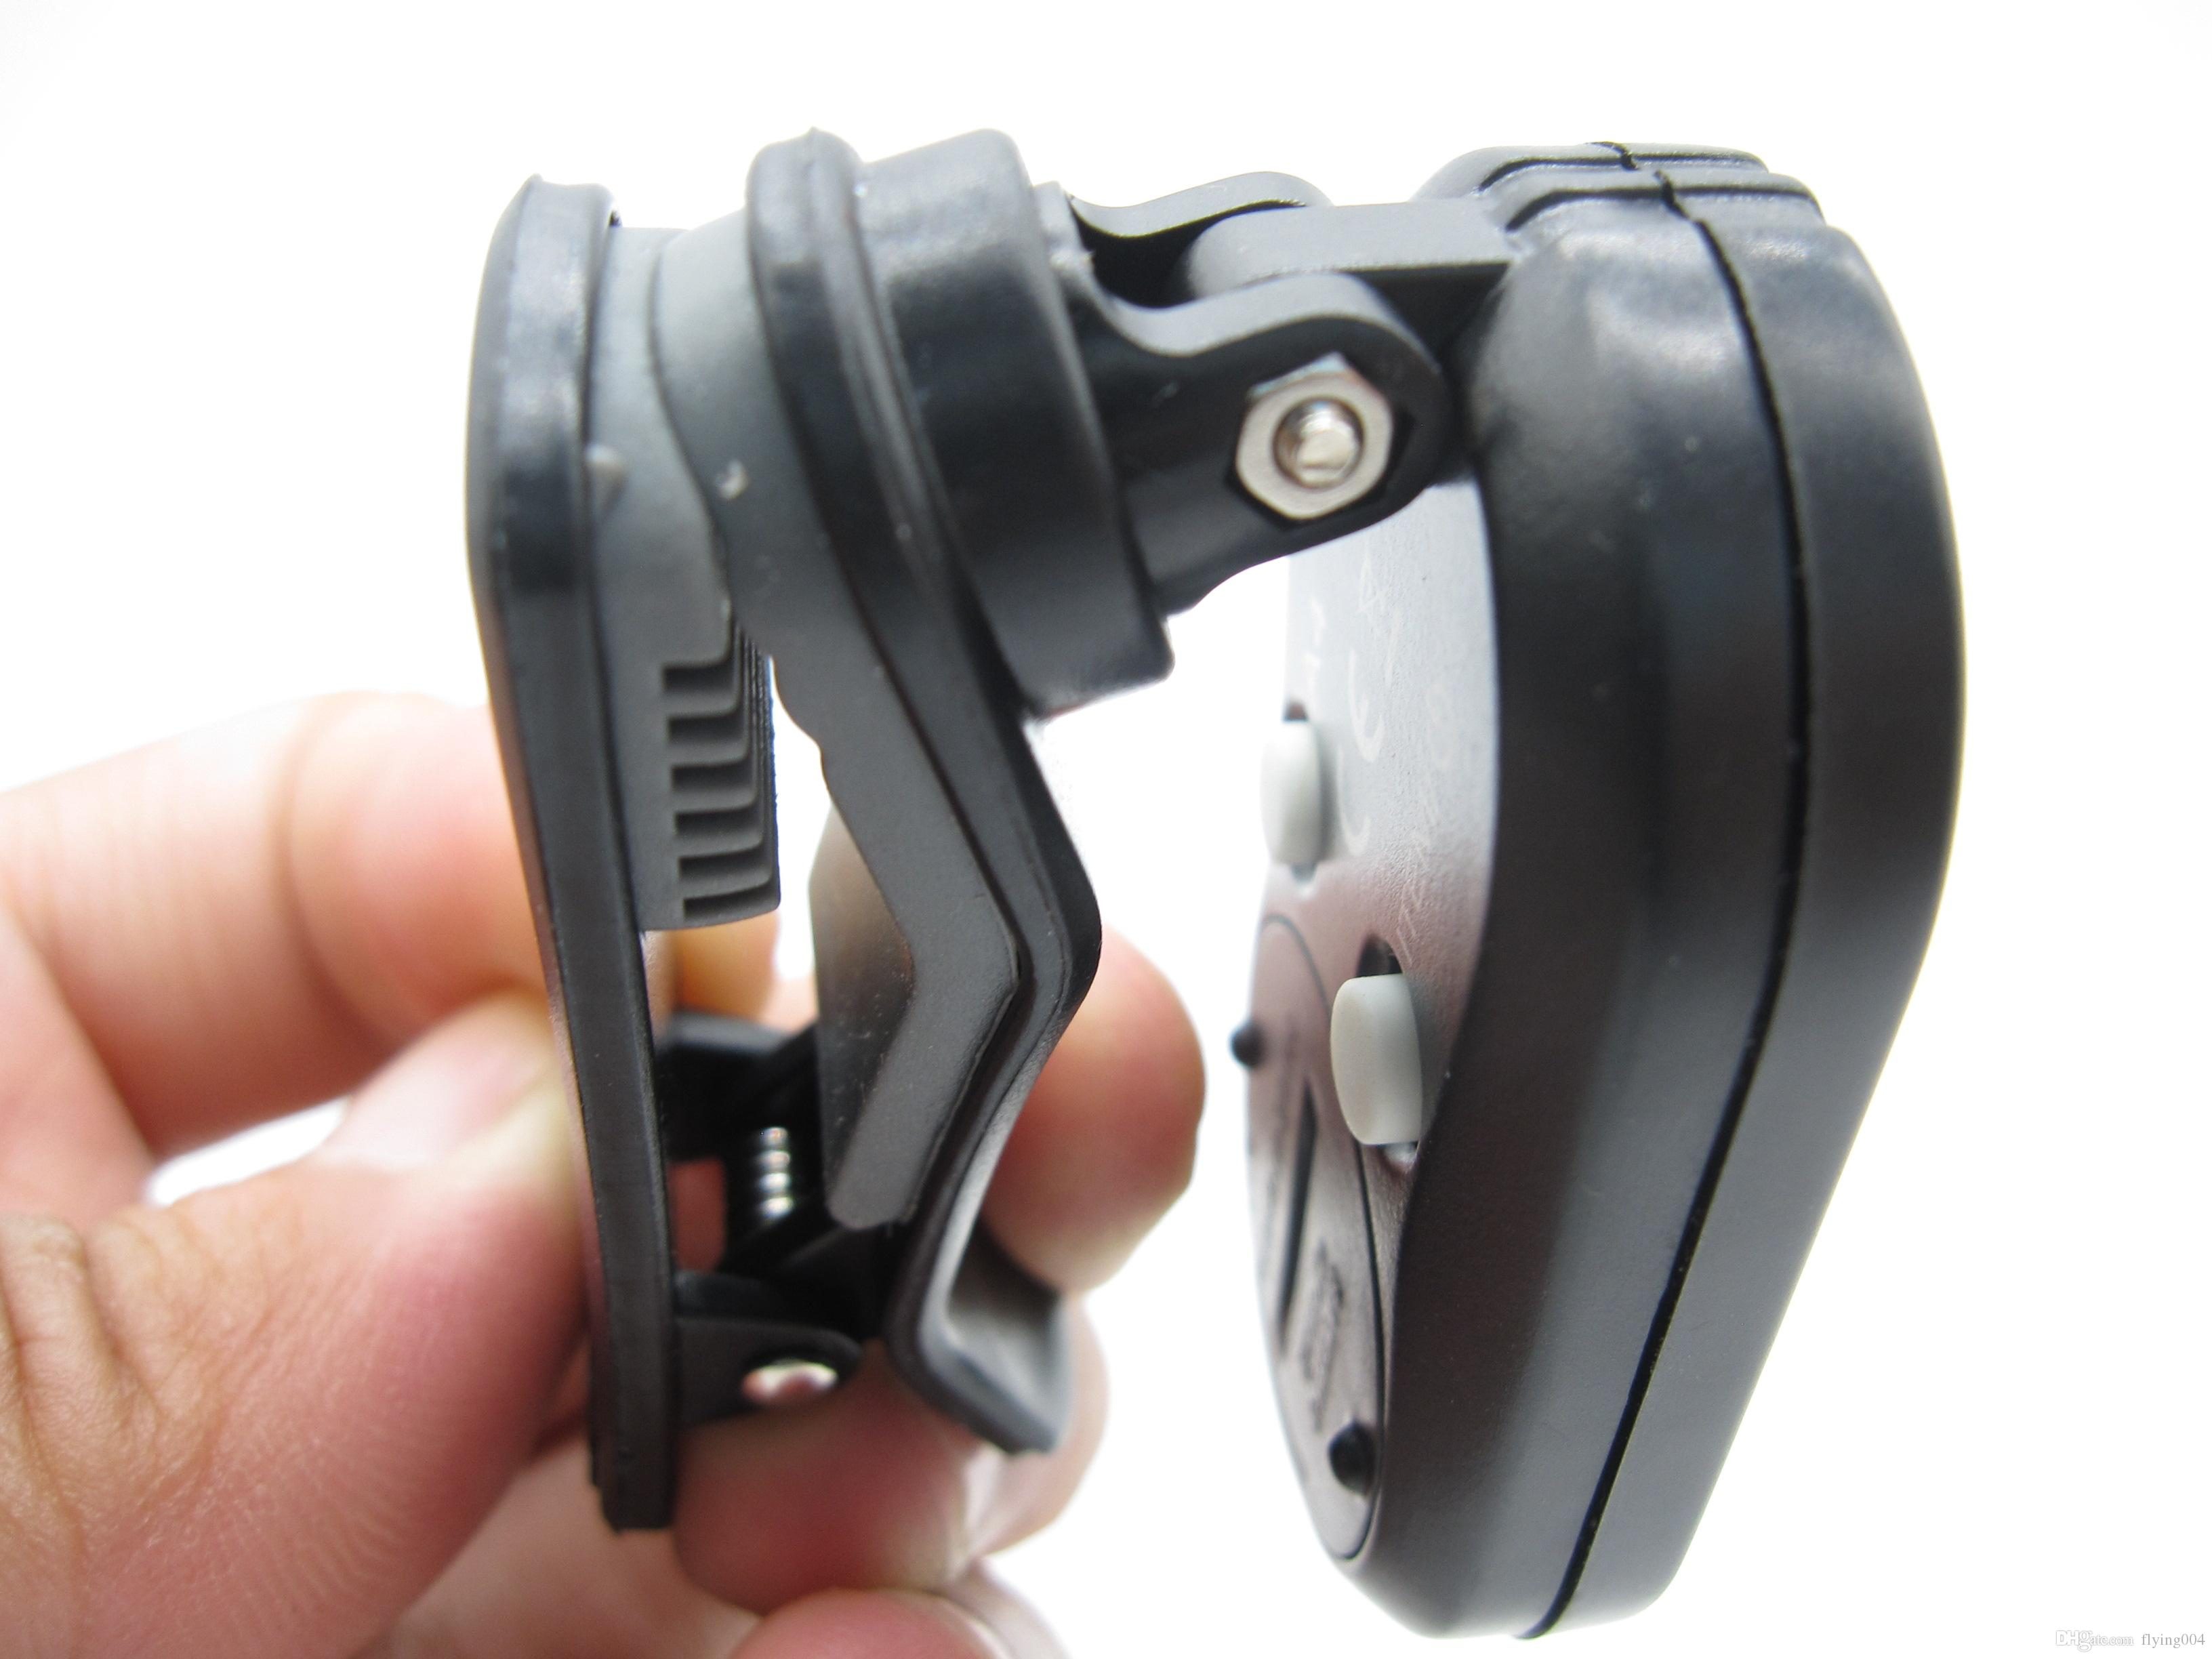 Professional Guitar Tuner - Clip-On Tuner لجميع الآلات - مع لوني ، جيتار ، باس ، كمان ، القيثارة مع شاشة LCD